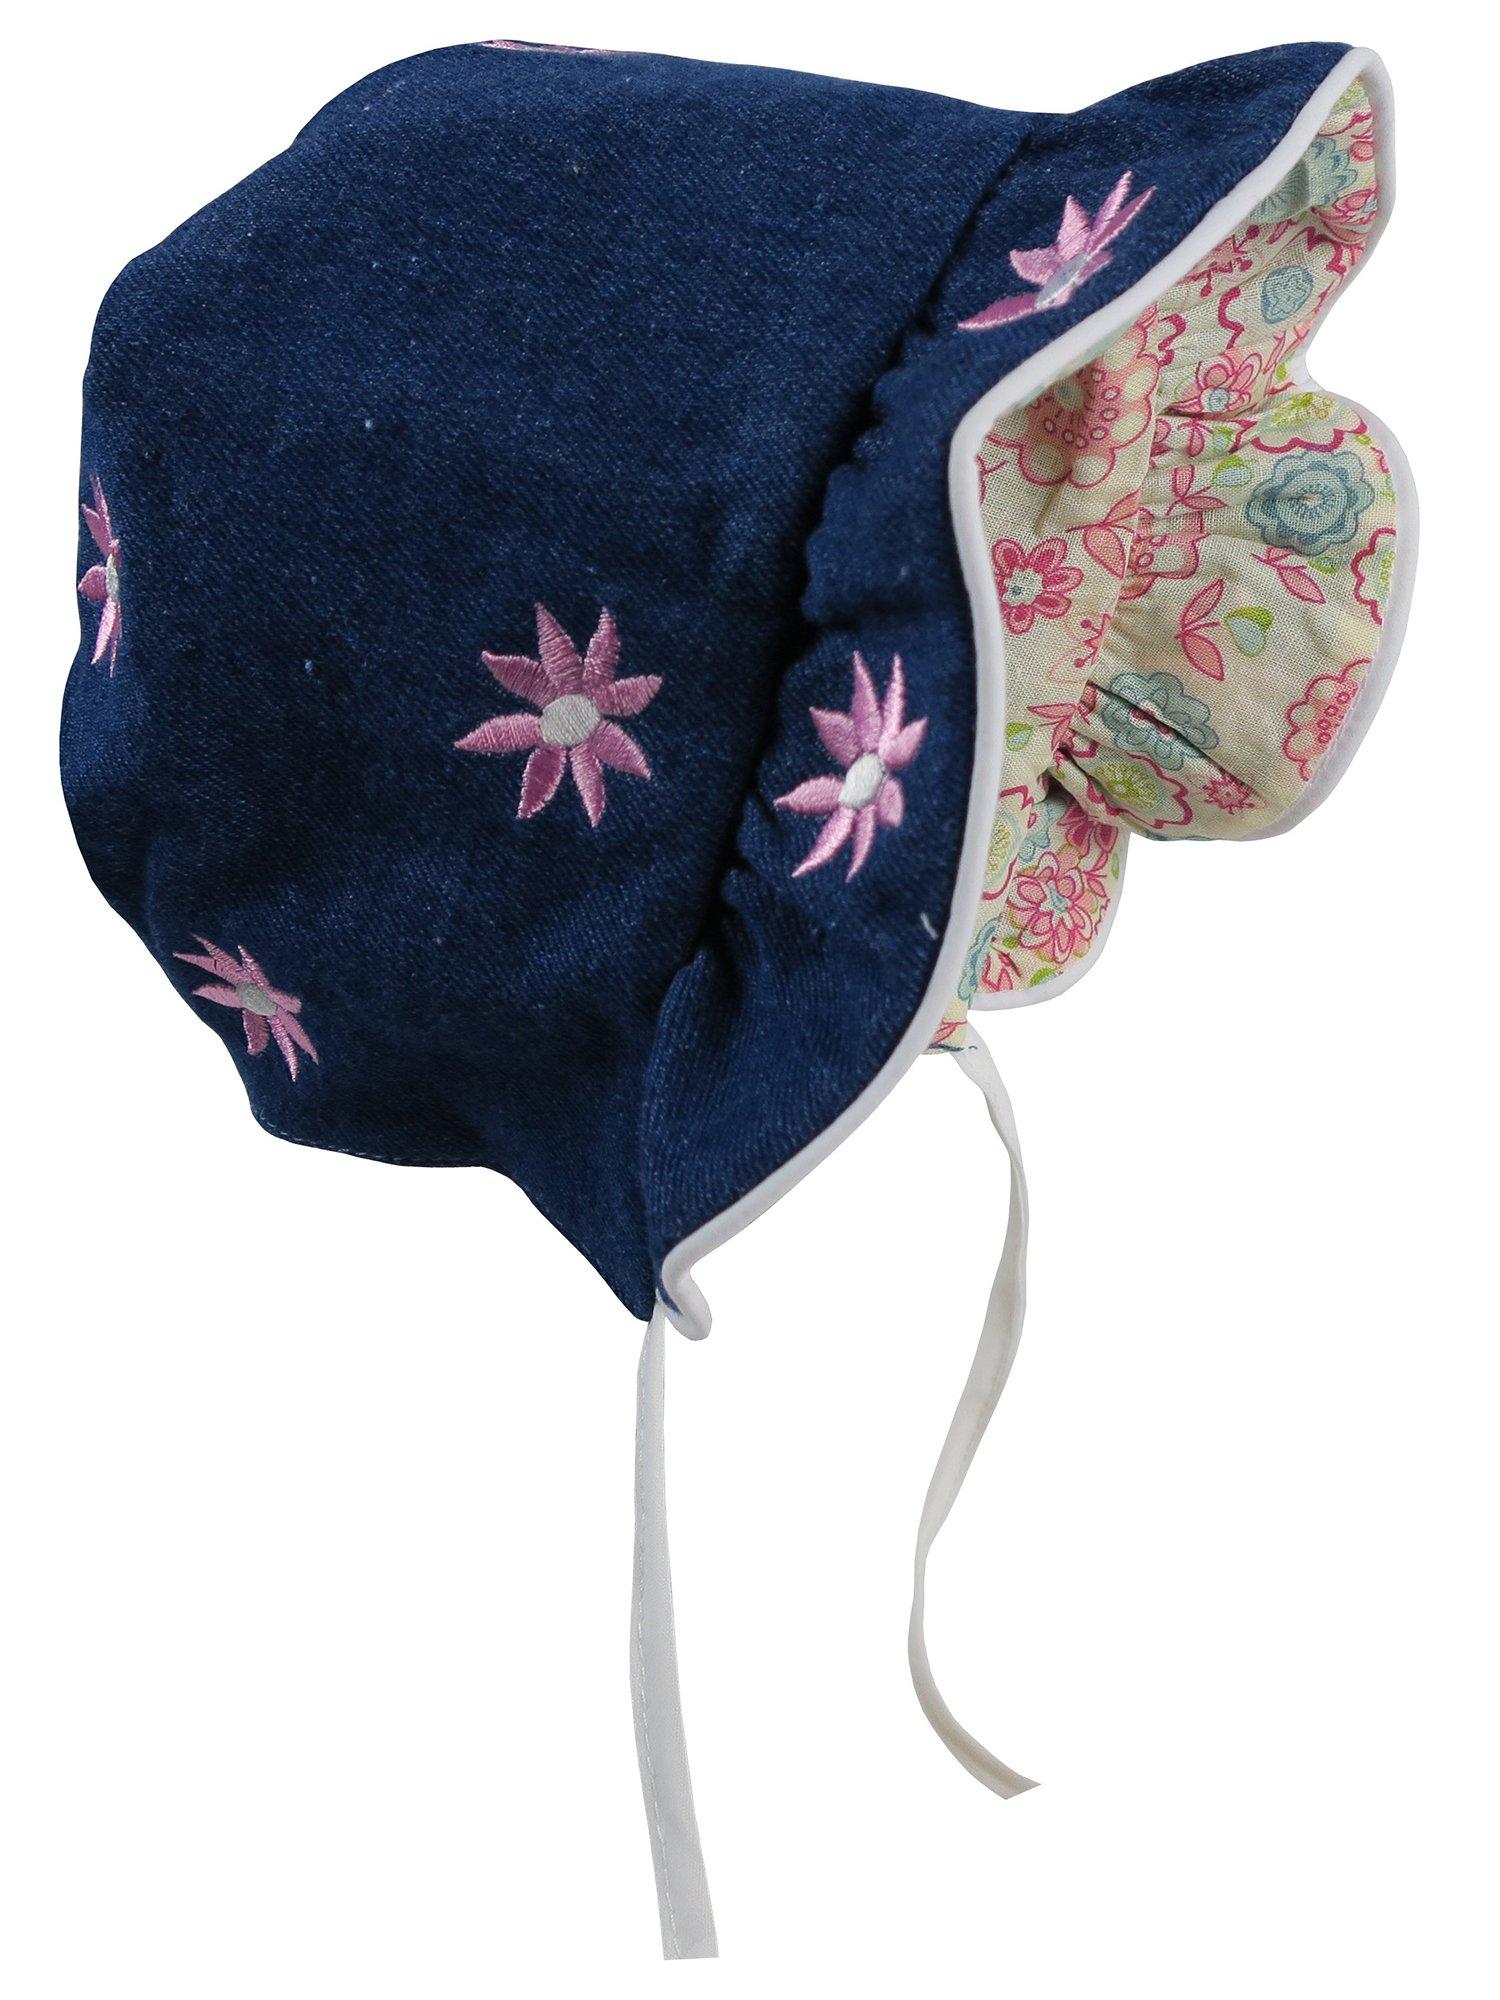 NICE CAPS Baby Girls Infants Solid to Print Reversible Summer Sun Bonnet Cap Hat Headwear